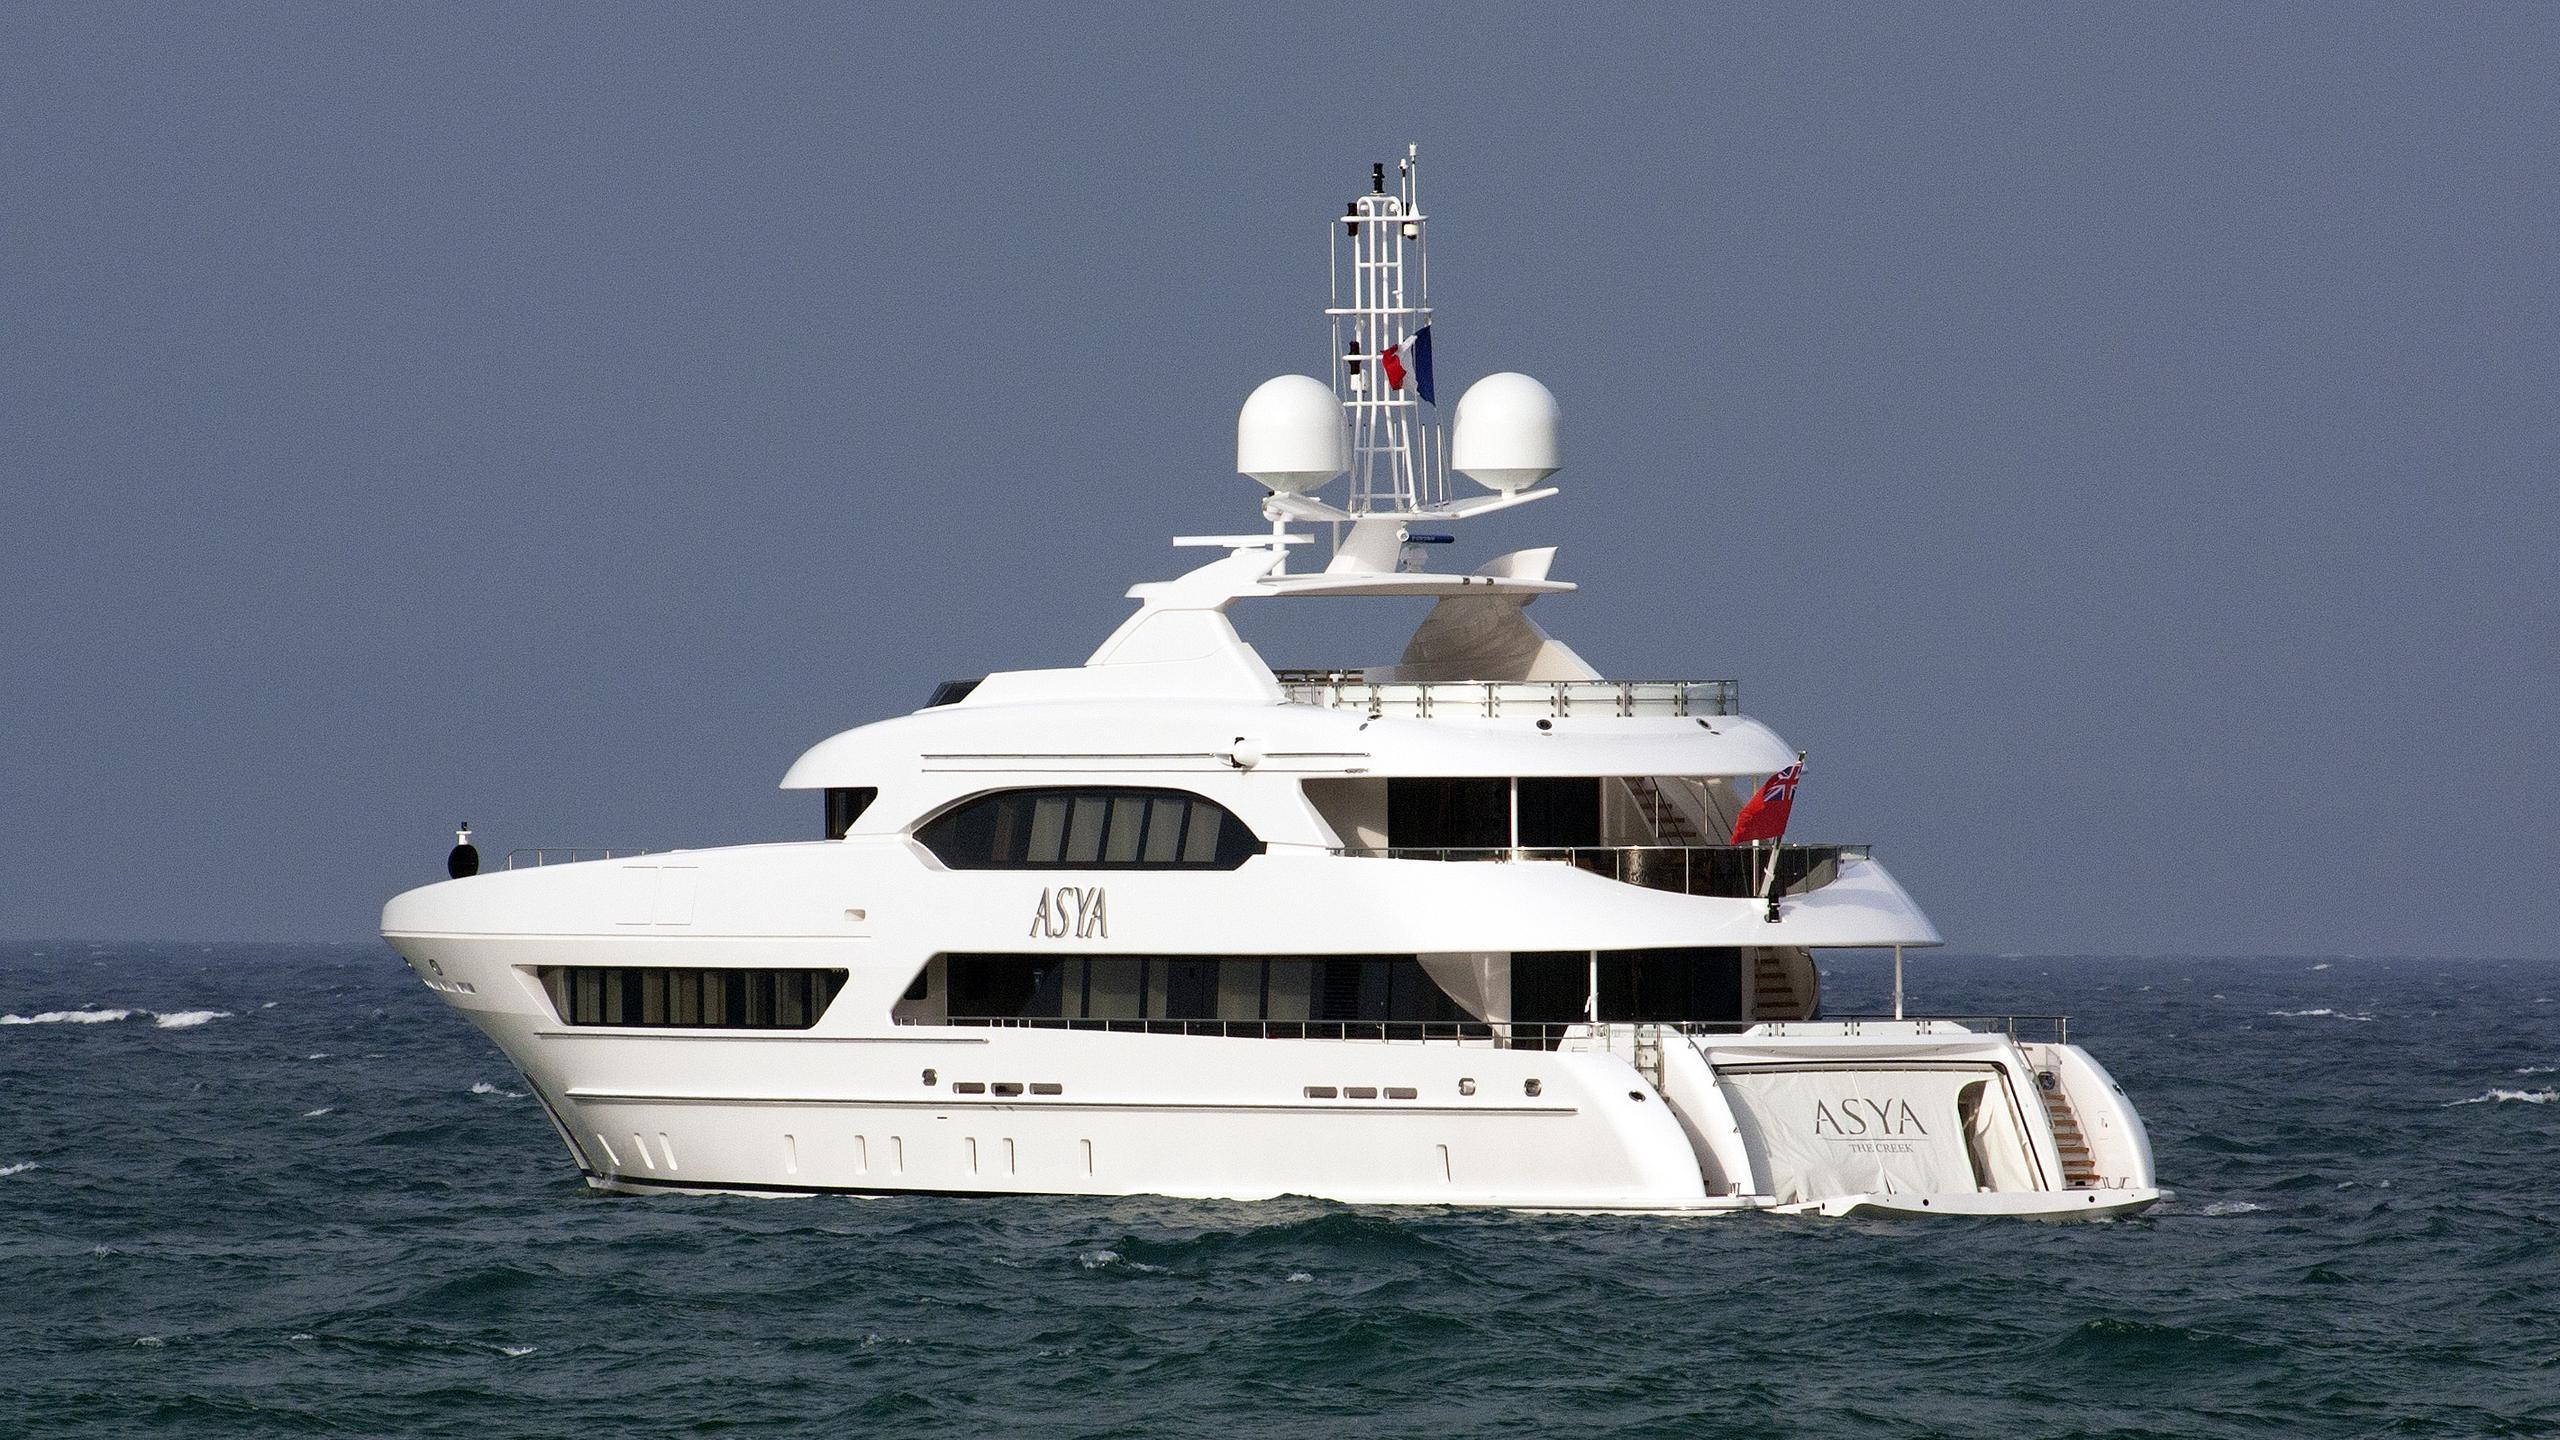 asya motoryacht heesen yachts 2015 47m half stern